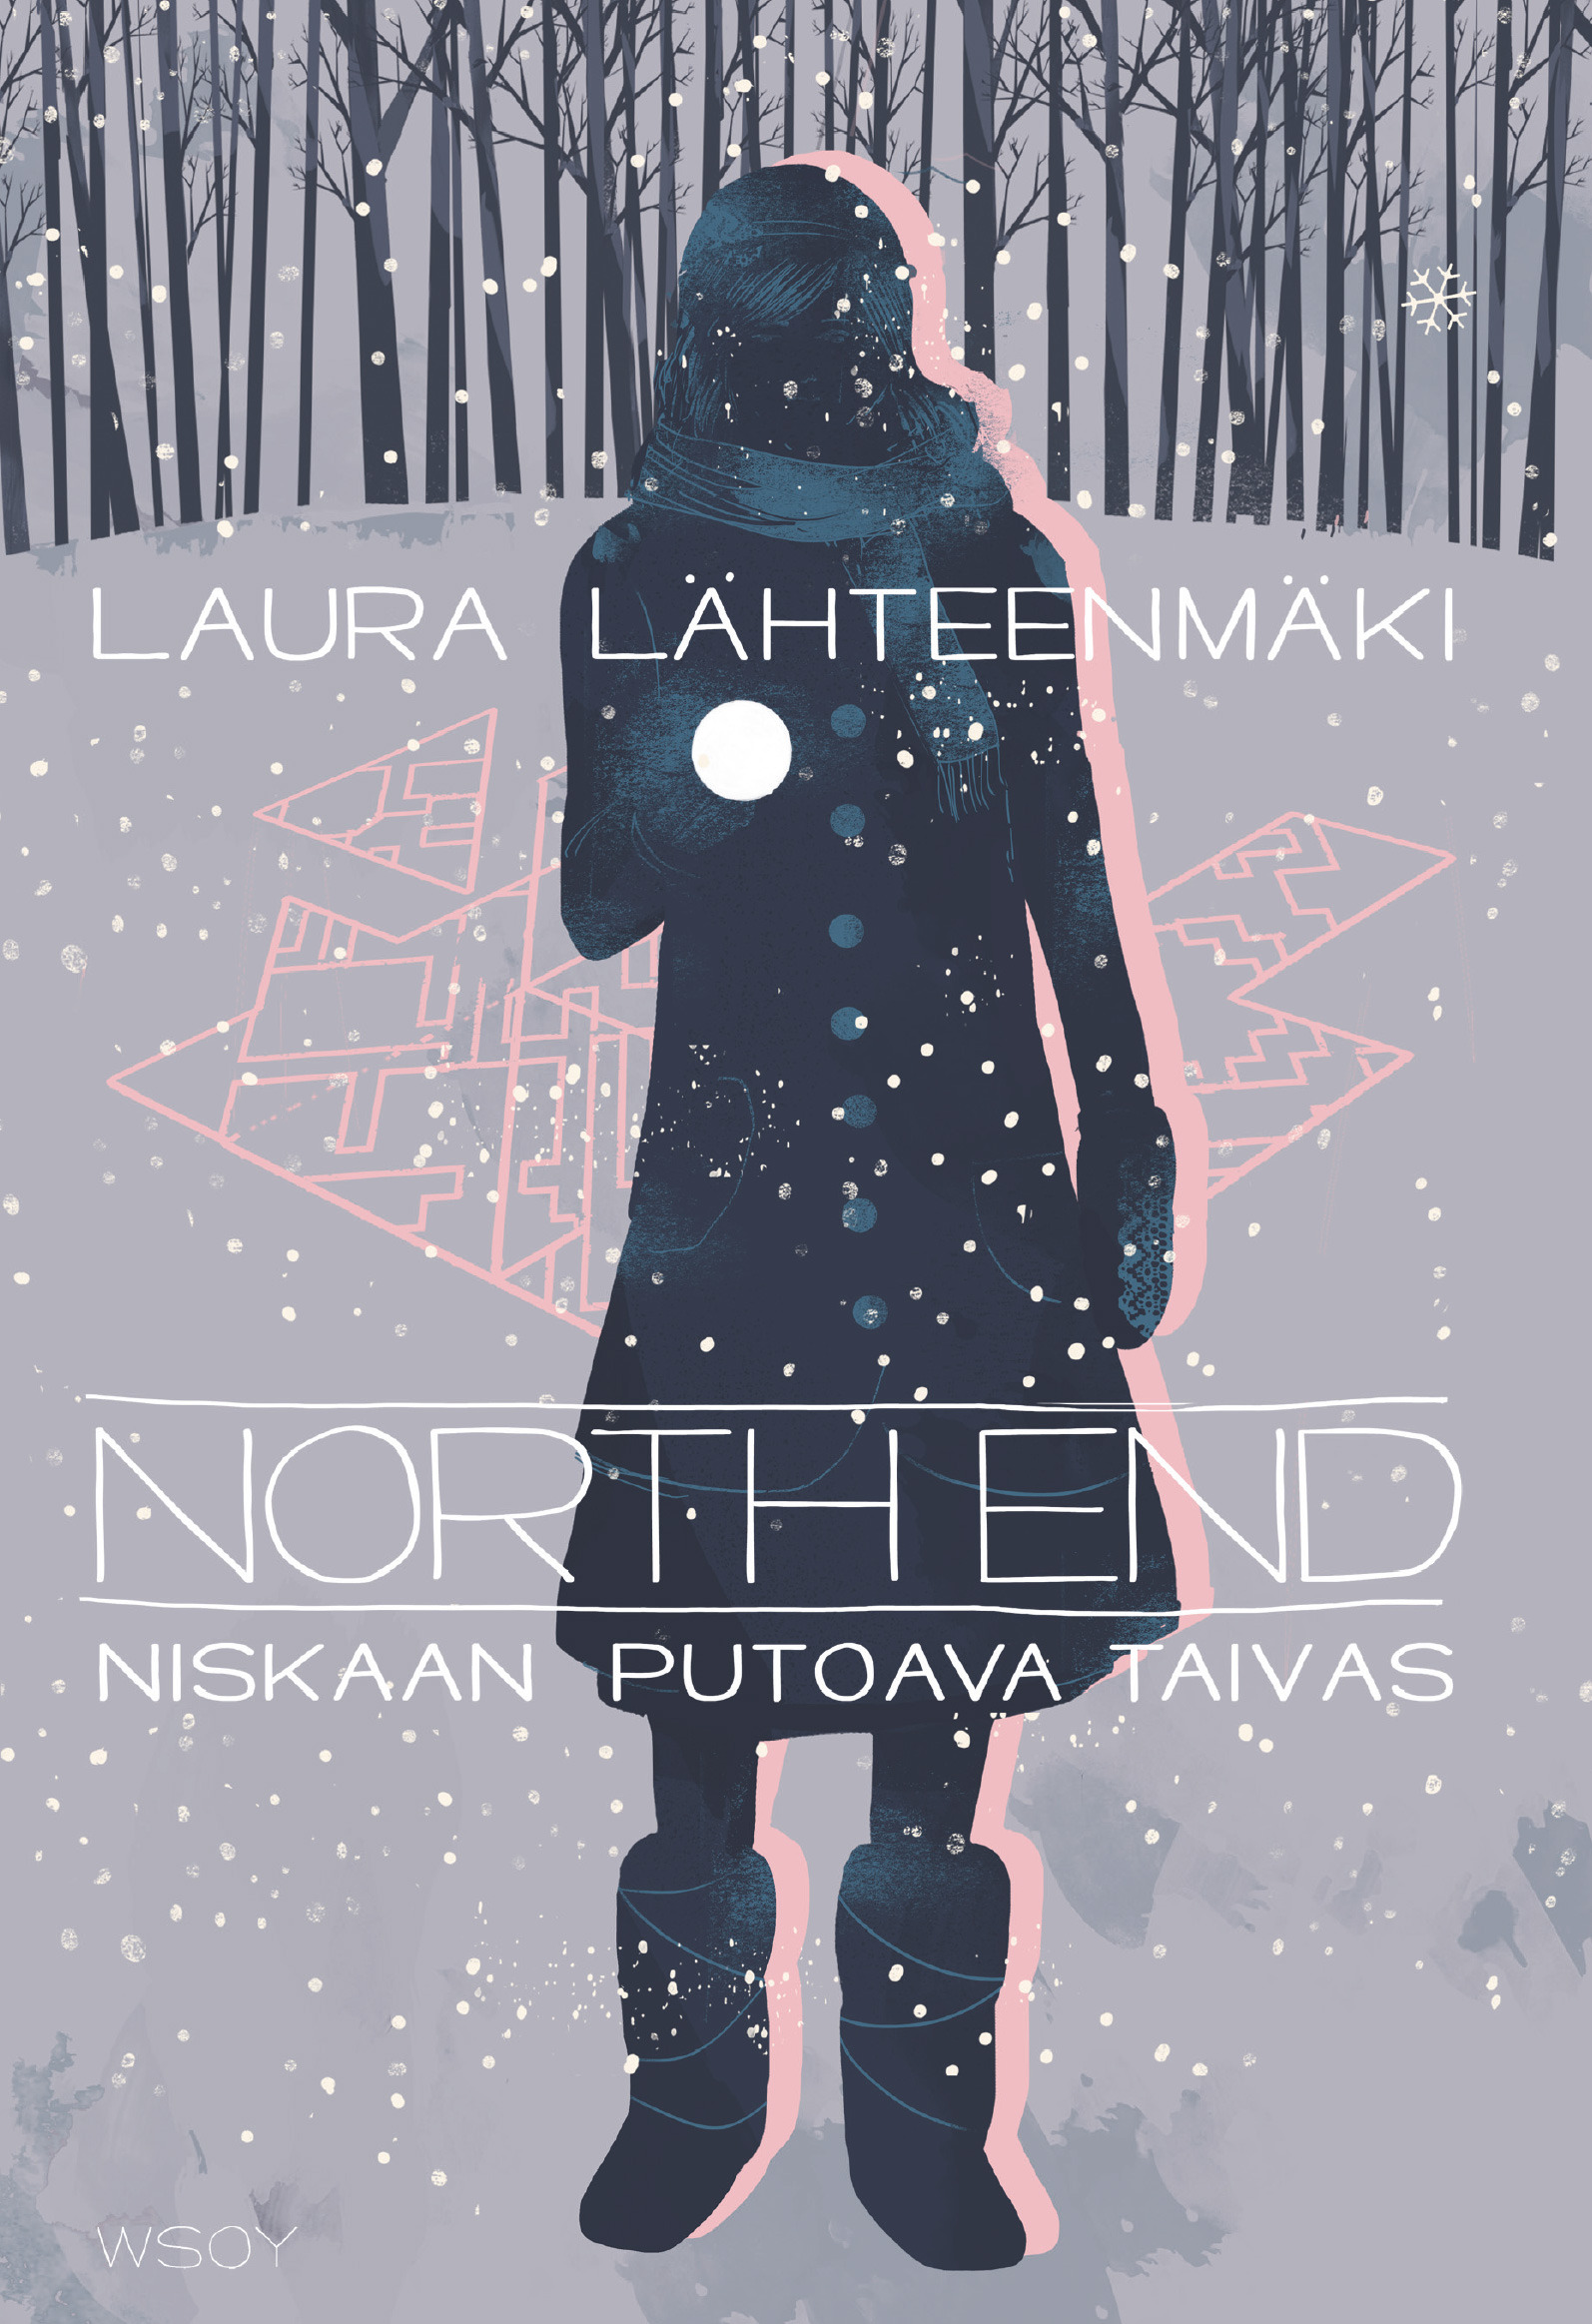 Lähteenmäki, Laura - Niskaan putoava taivas: North End I, e-kirja